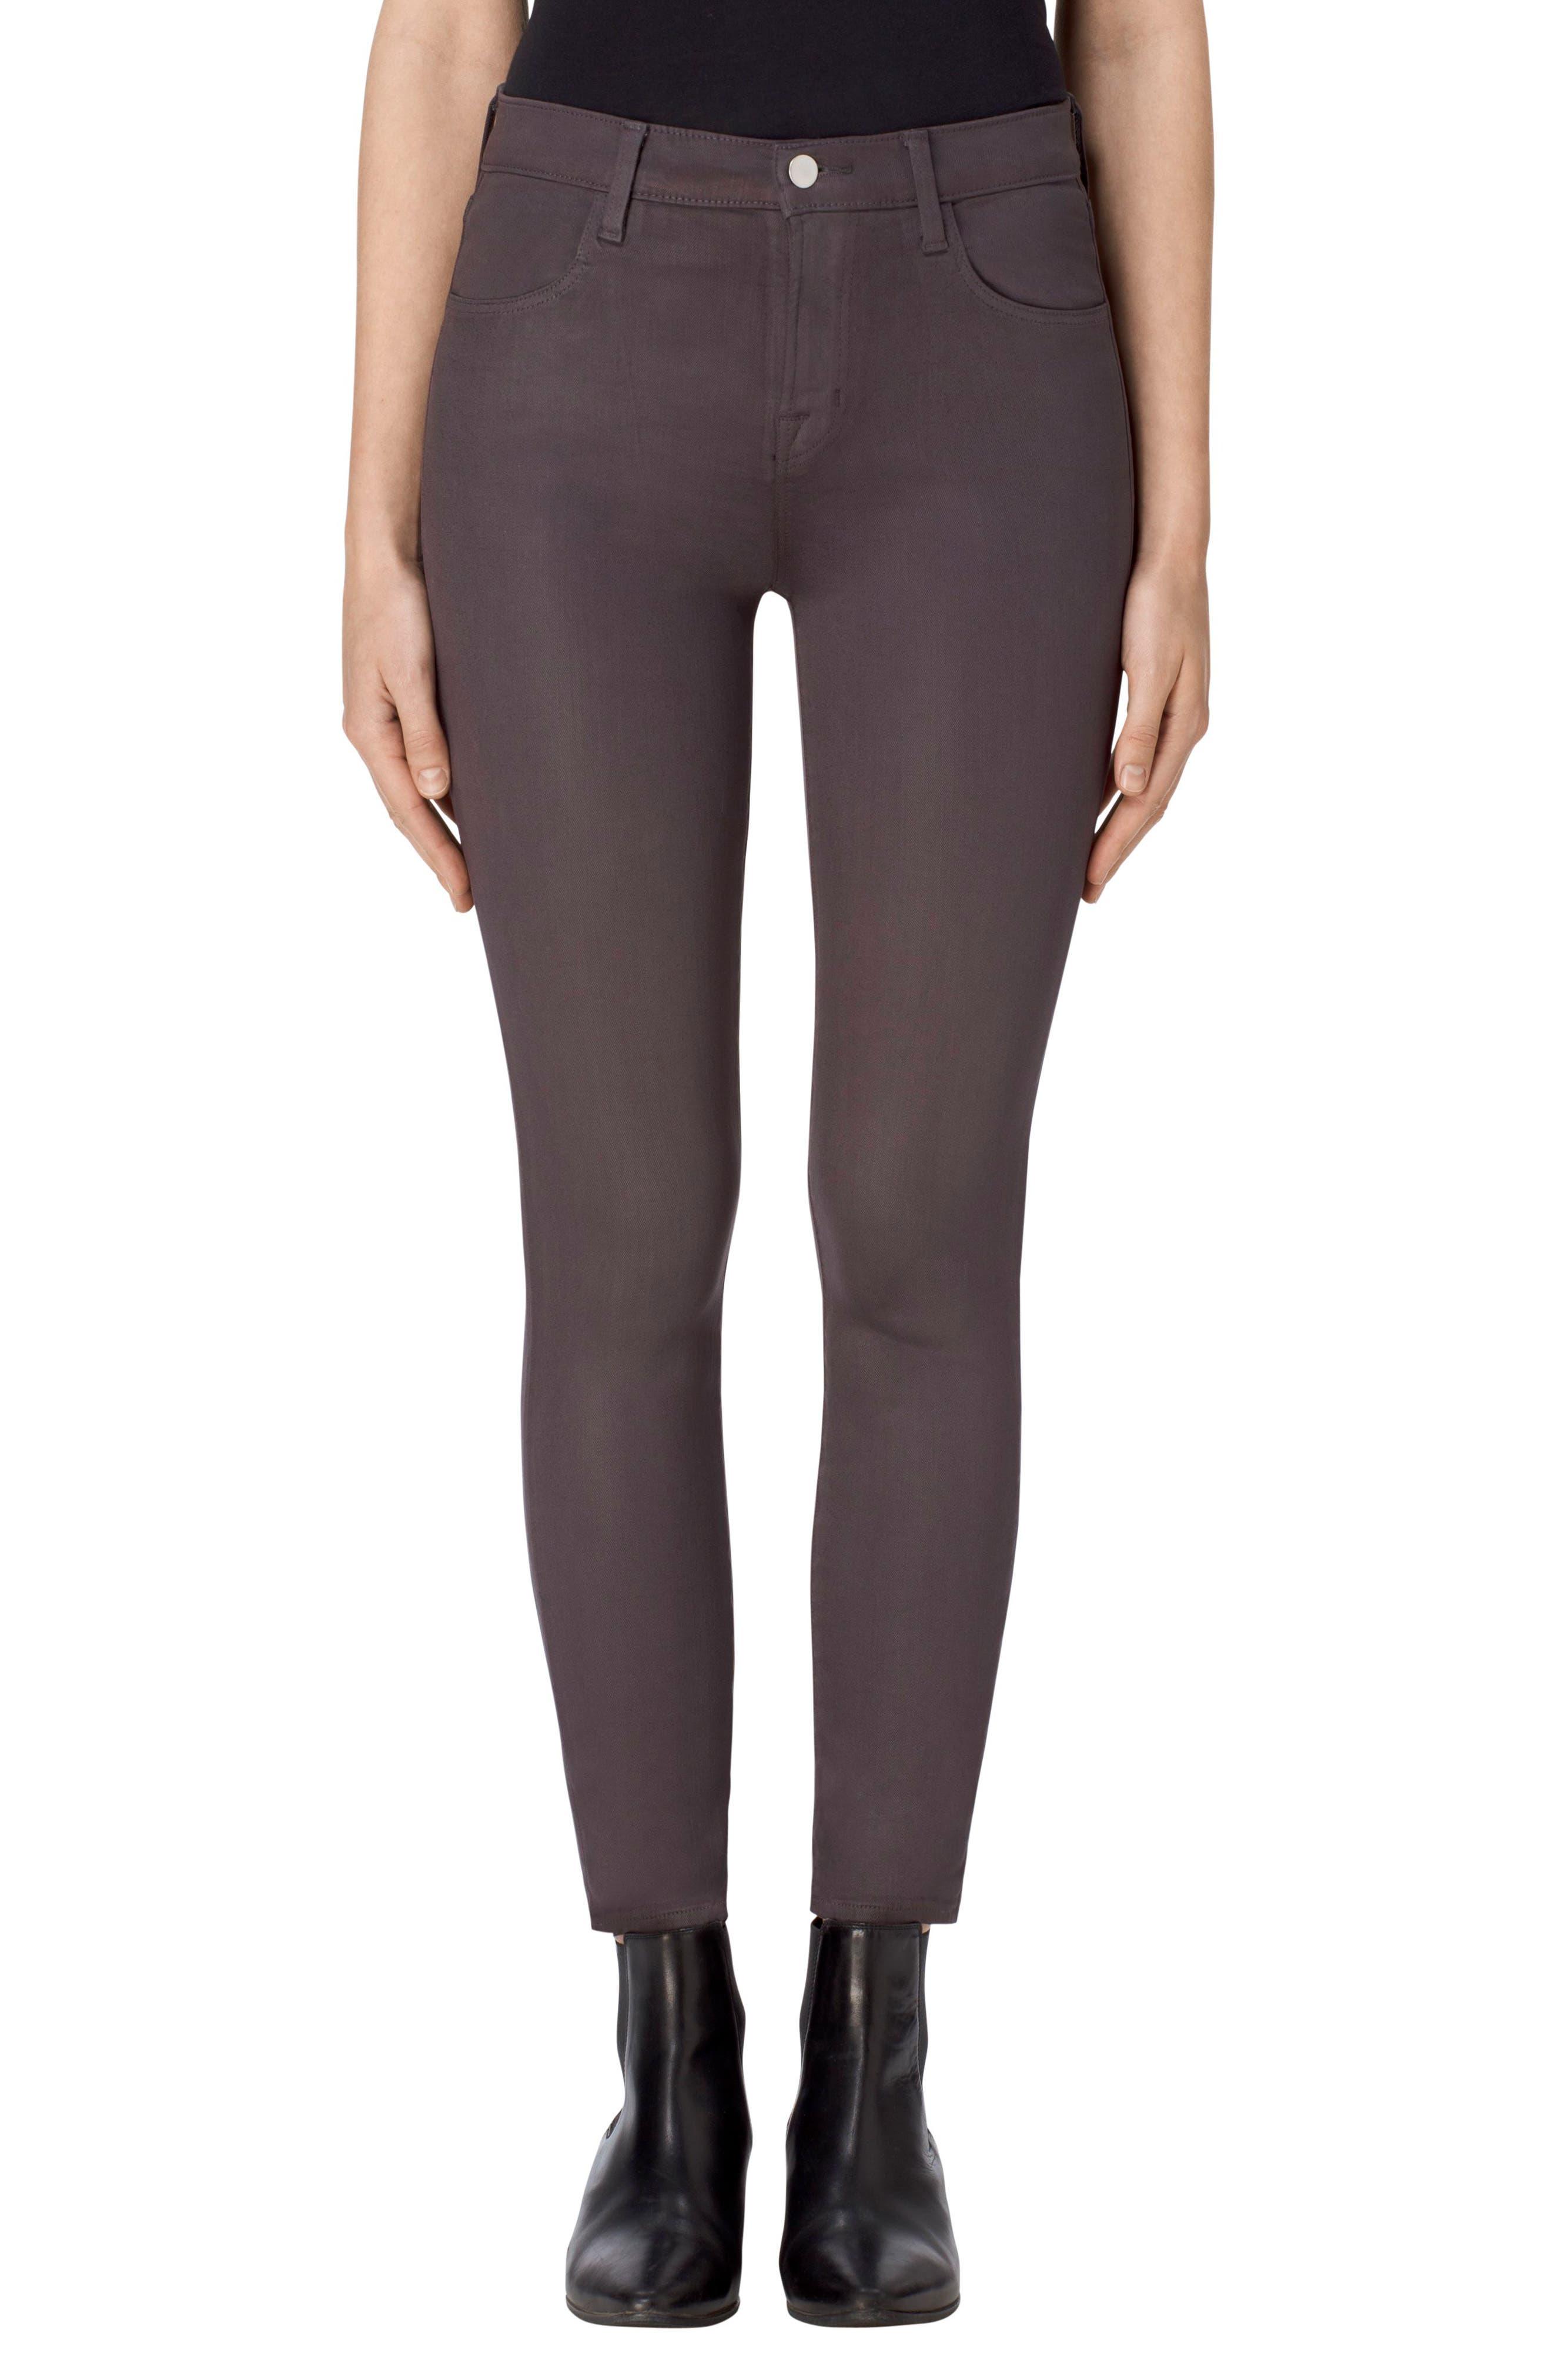 Alana High Waist Crop Skinny Jeans,                         Main,                         color, Light Coated Chrome